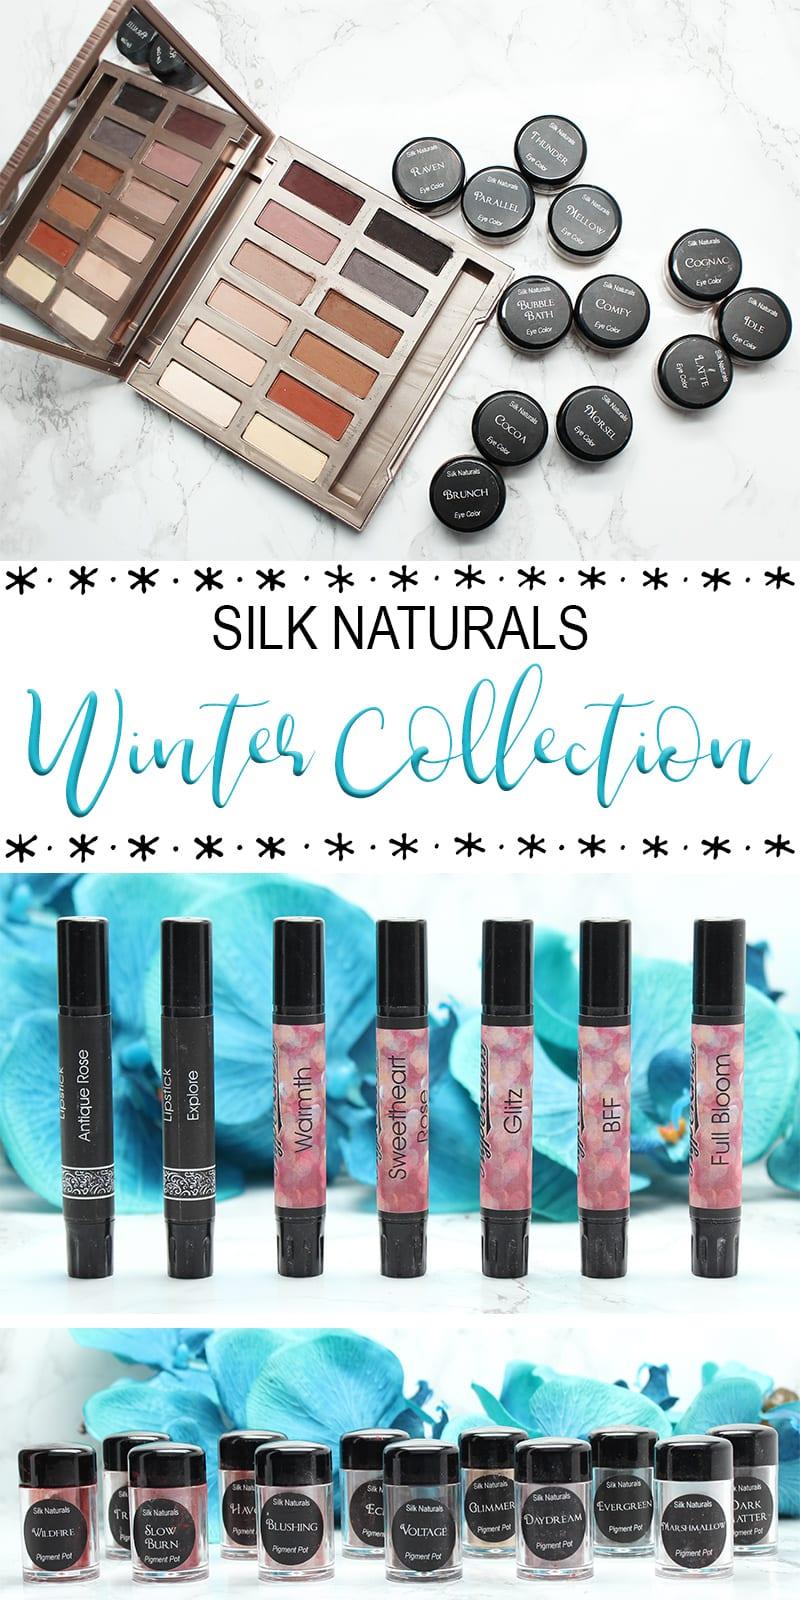 Silk Naturals Winter 2017 Collection